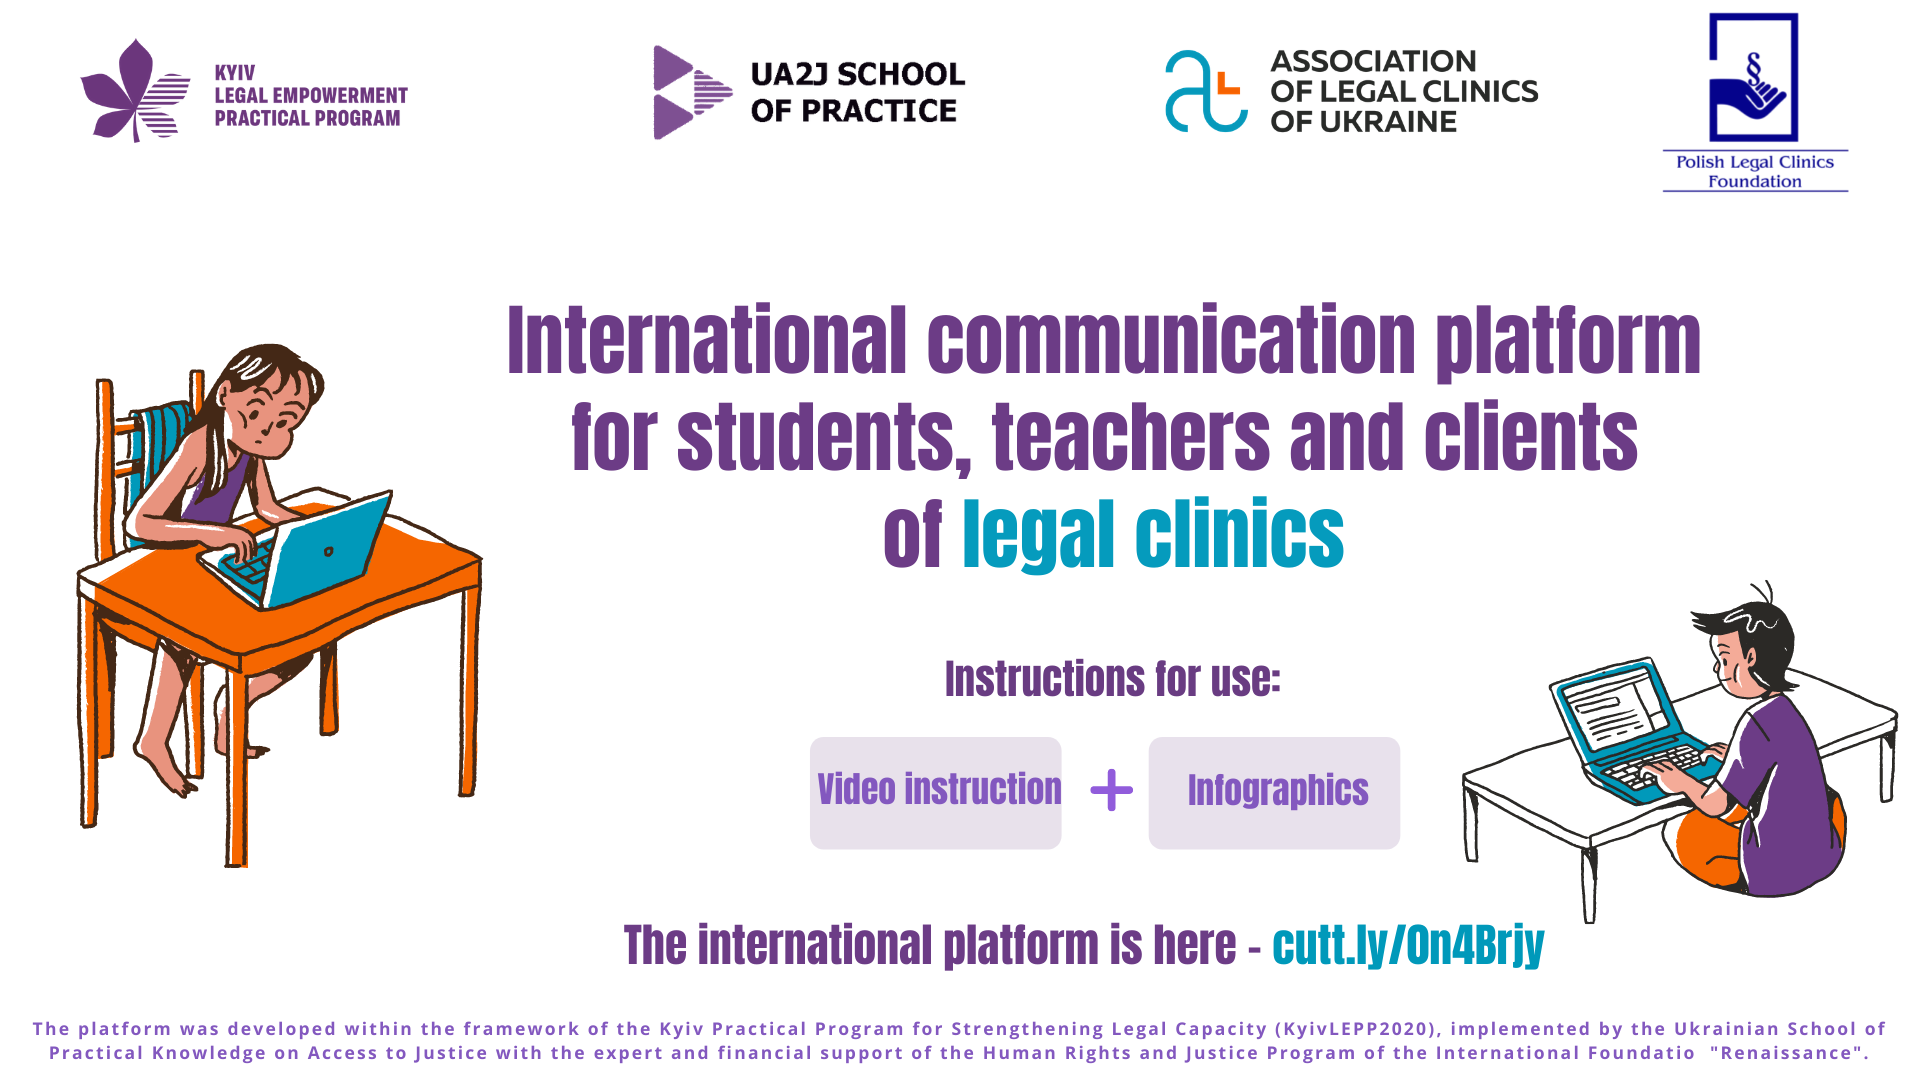 Communication platform for the legal clinics of Ukraine and Poland